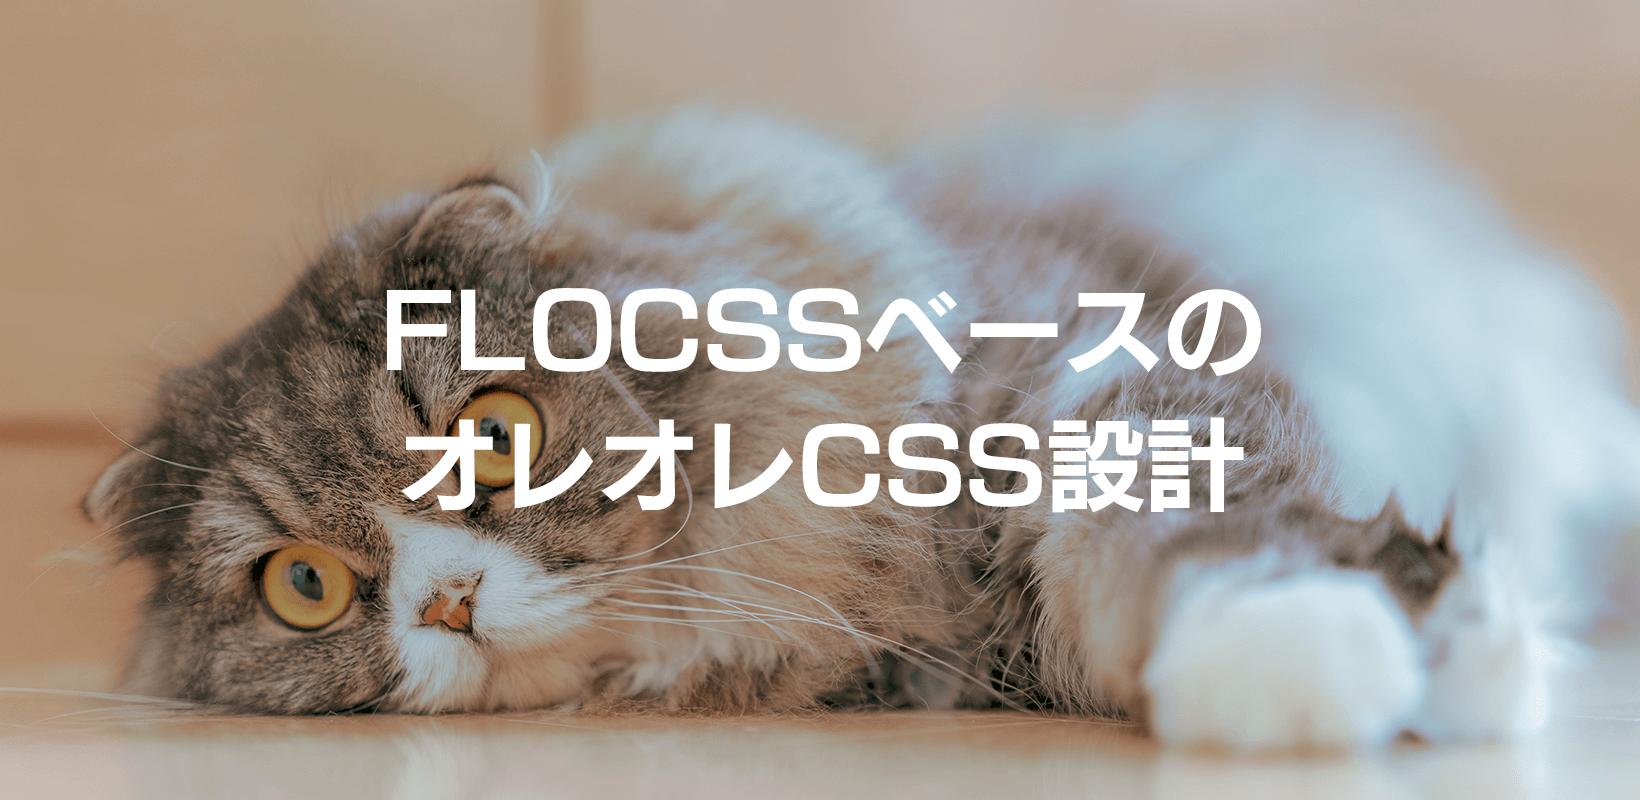 FLOCSSベースのオレオレCSS設計の紹介のイメージ画像